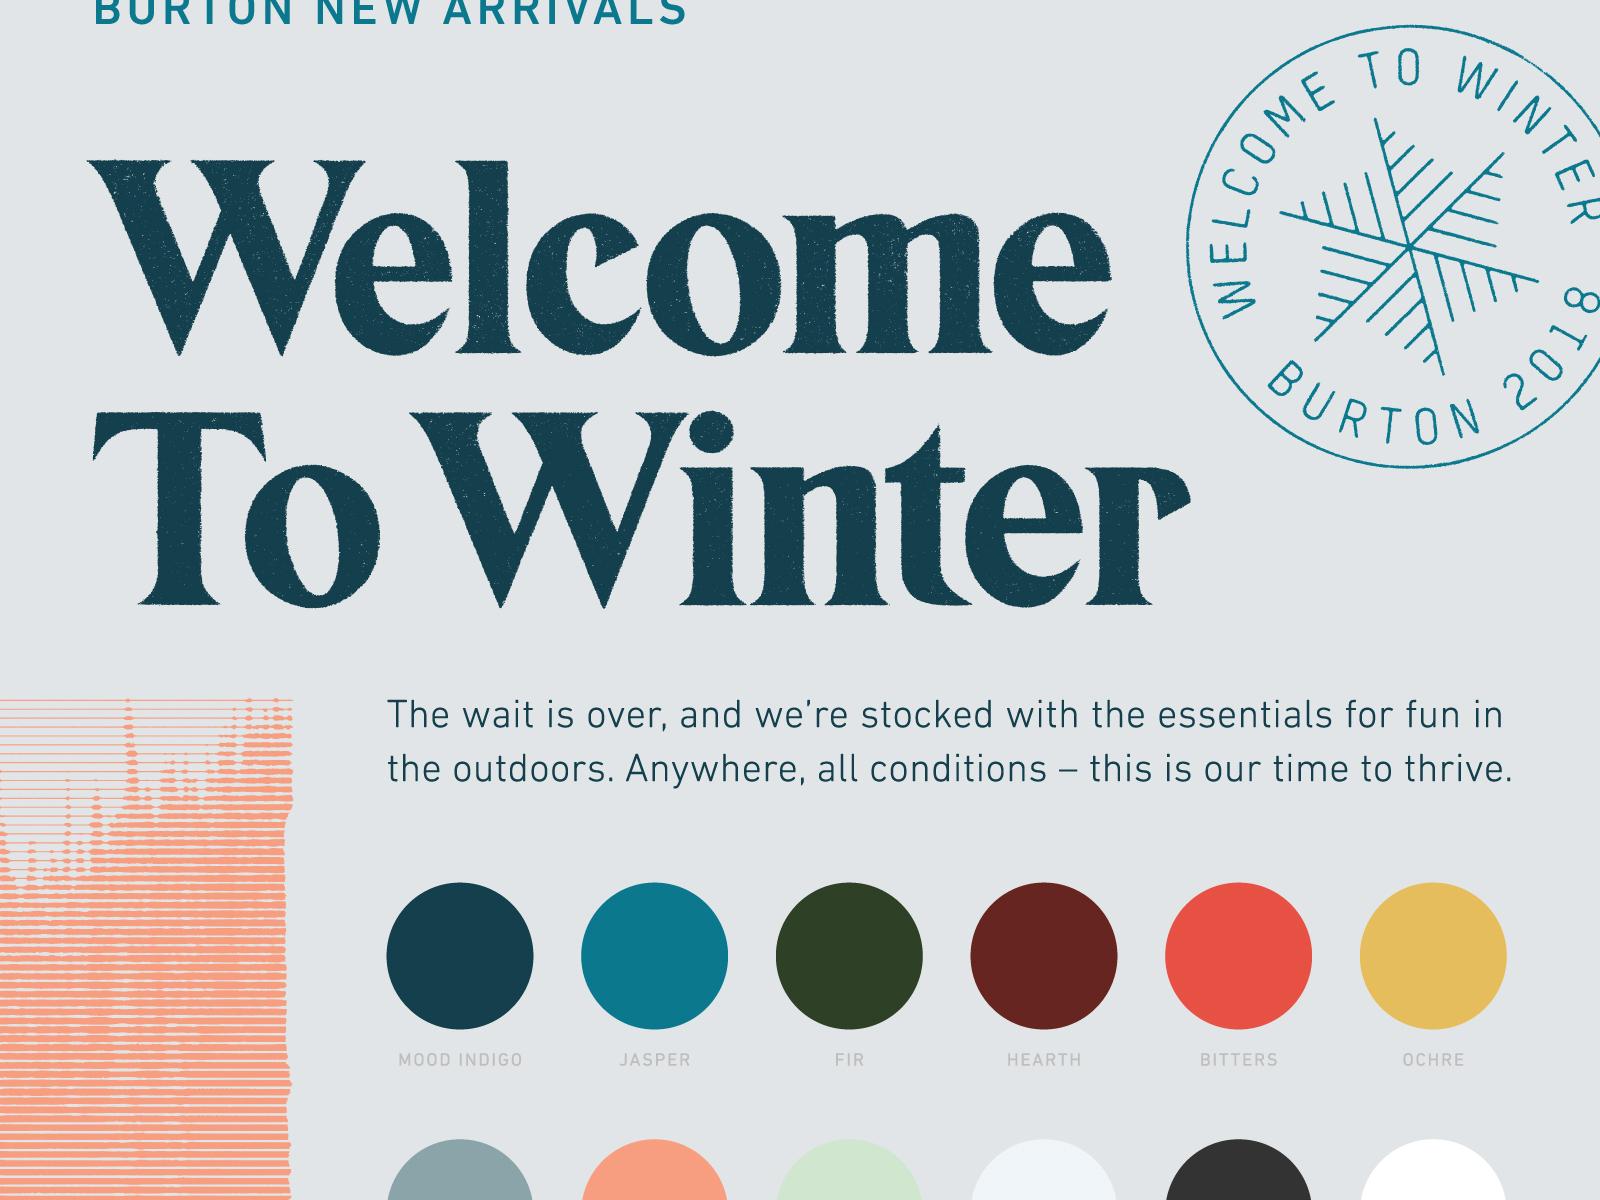 burton-18w-welcome-to-winter-1600.jpg